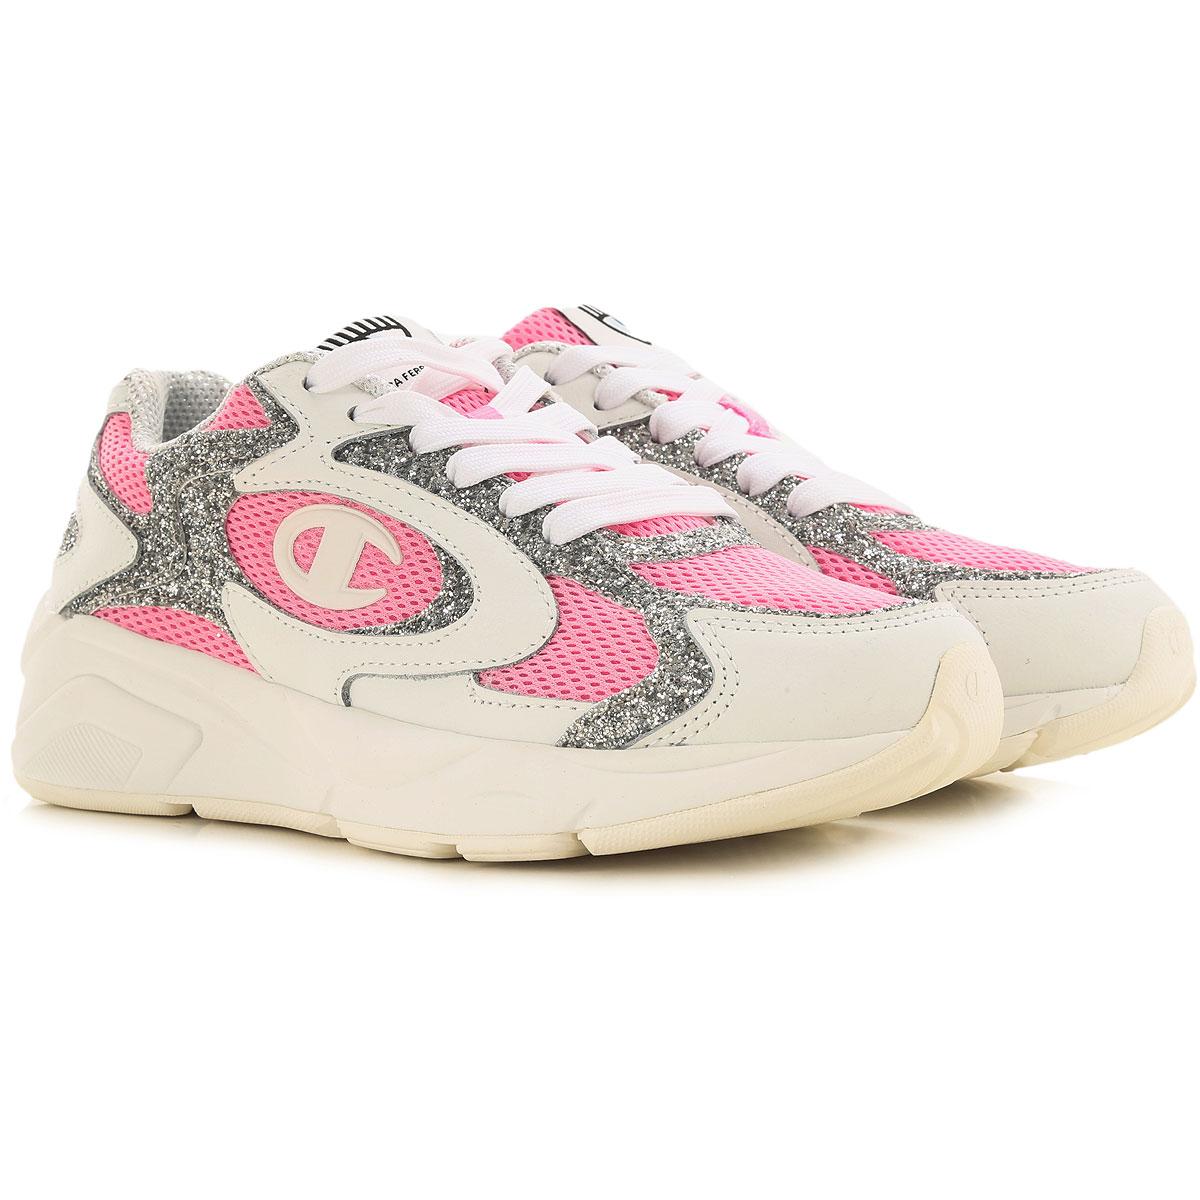 Chiara Ferragni Sneakers for Women On Sale, White, Fabric, 2019, 10 11 8 9